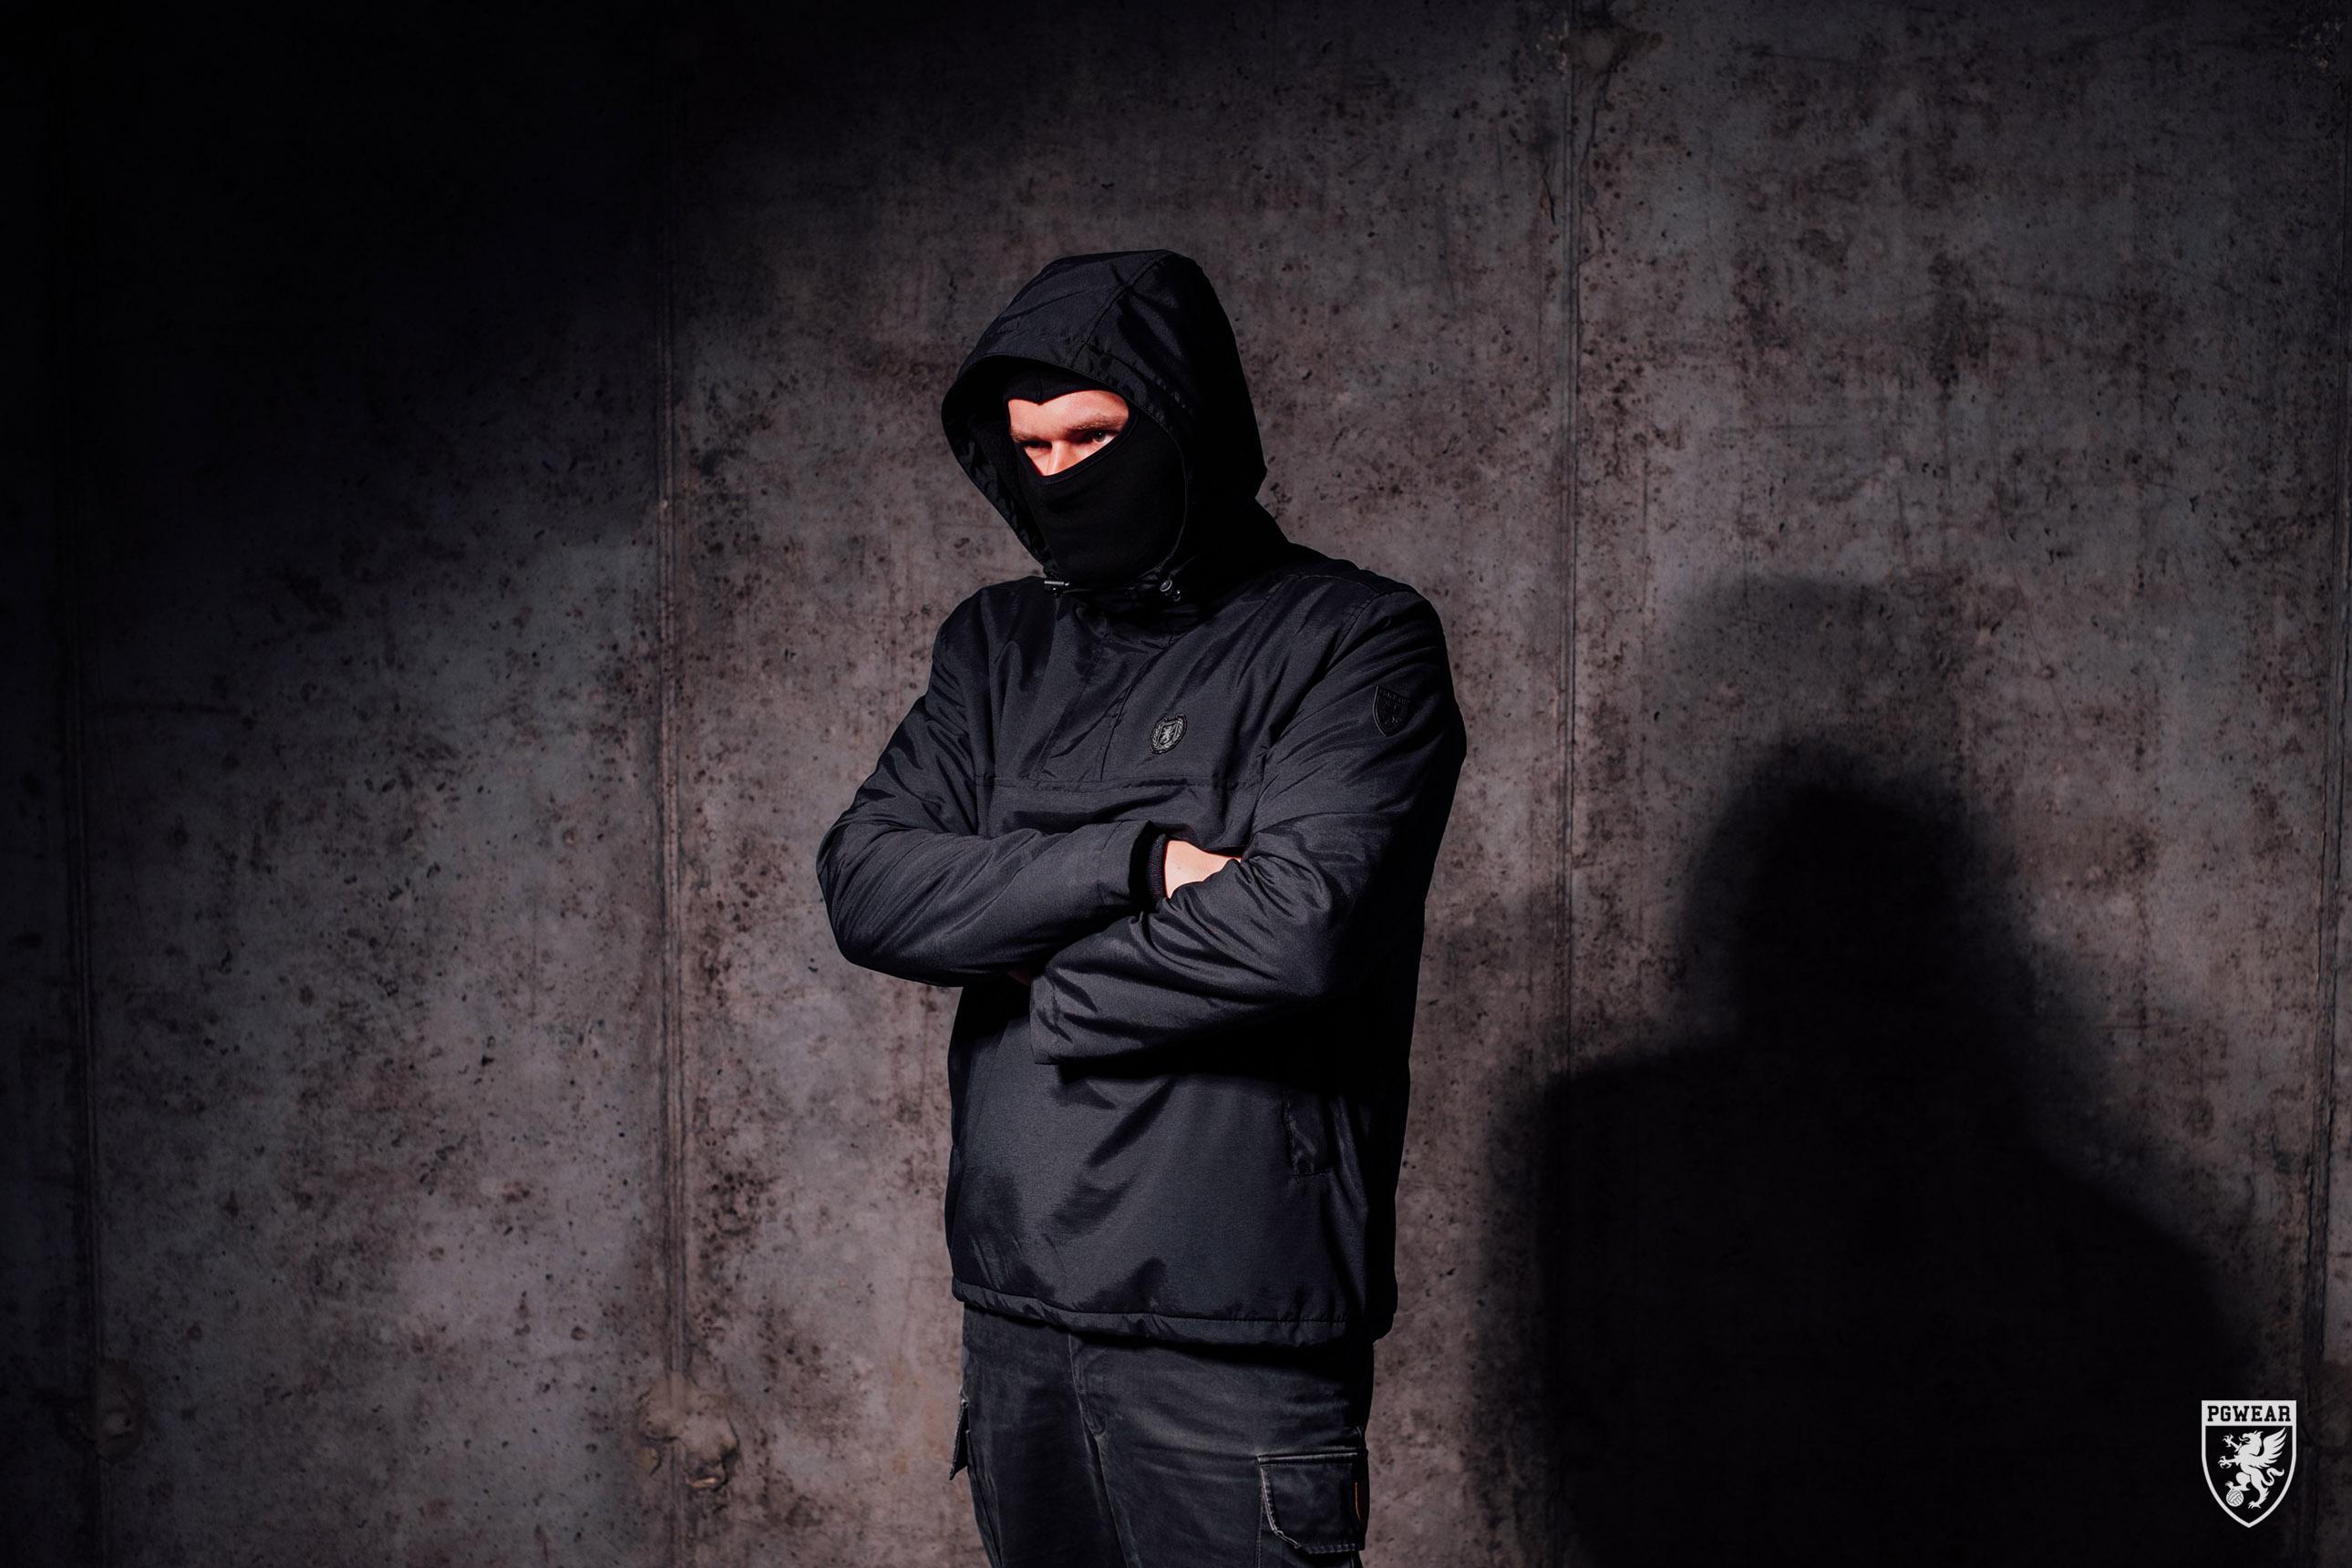 Koop de attack black jas van pgwear bij PGwear Nederland